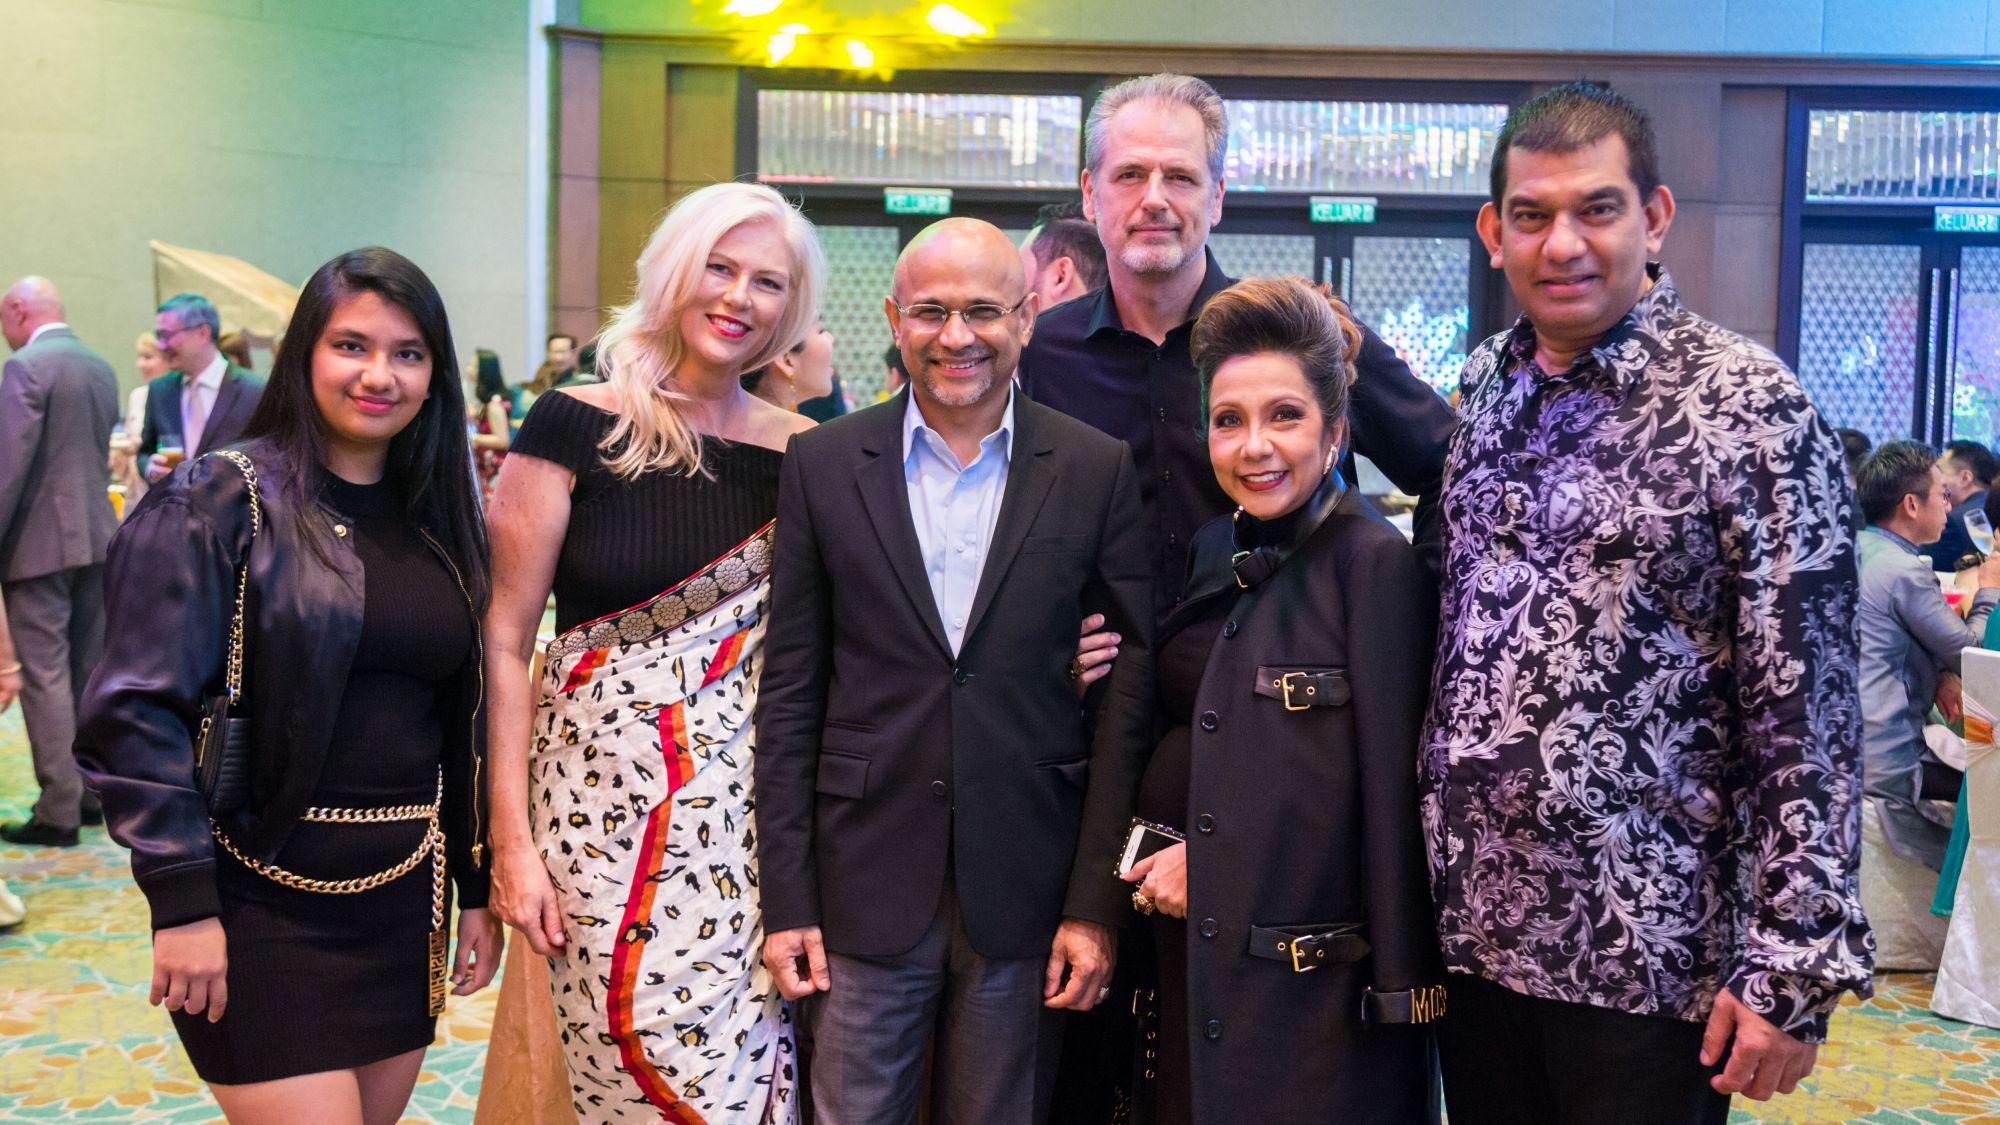 Allegra Abishegam, Christine Sterk, Dato' Sri Meer Sadik Habib, Henk Sterk and Datin Sri Chris and Dato' Sri Andrew Abishegam